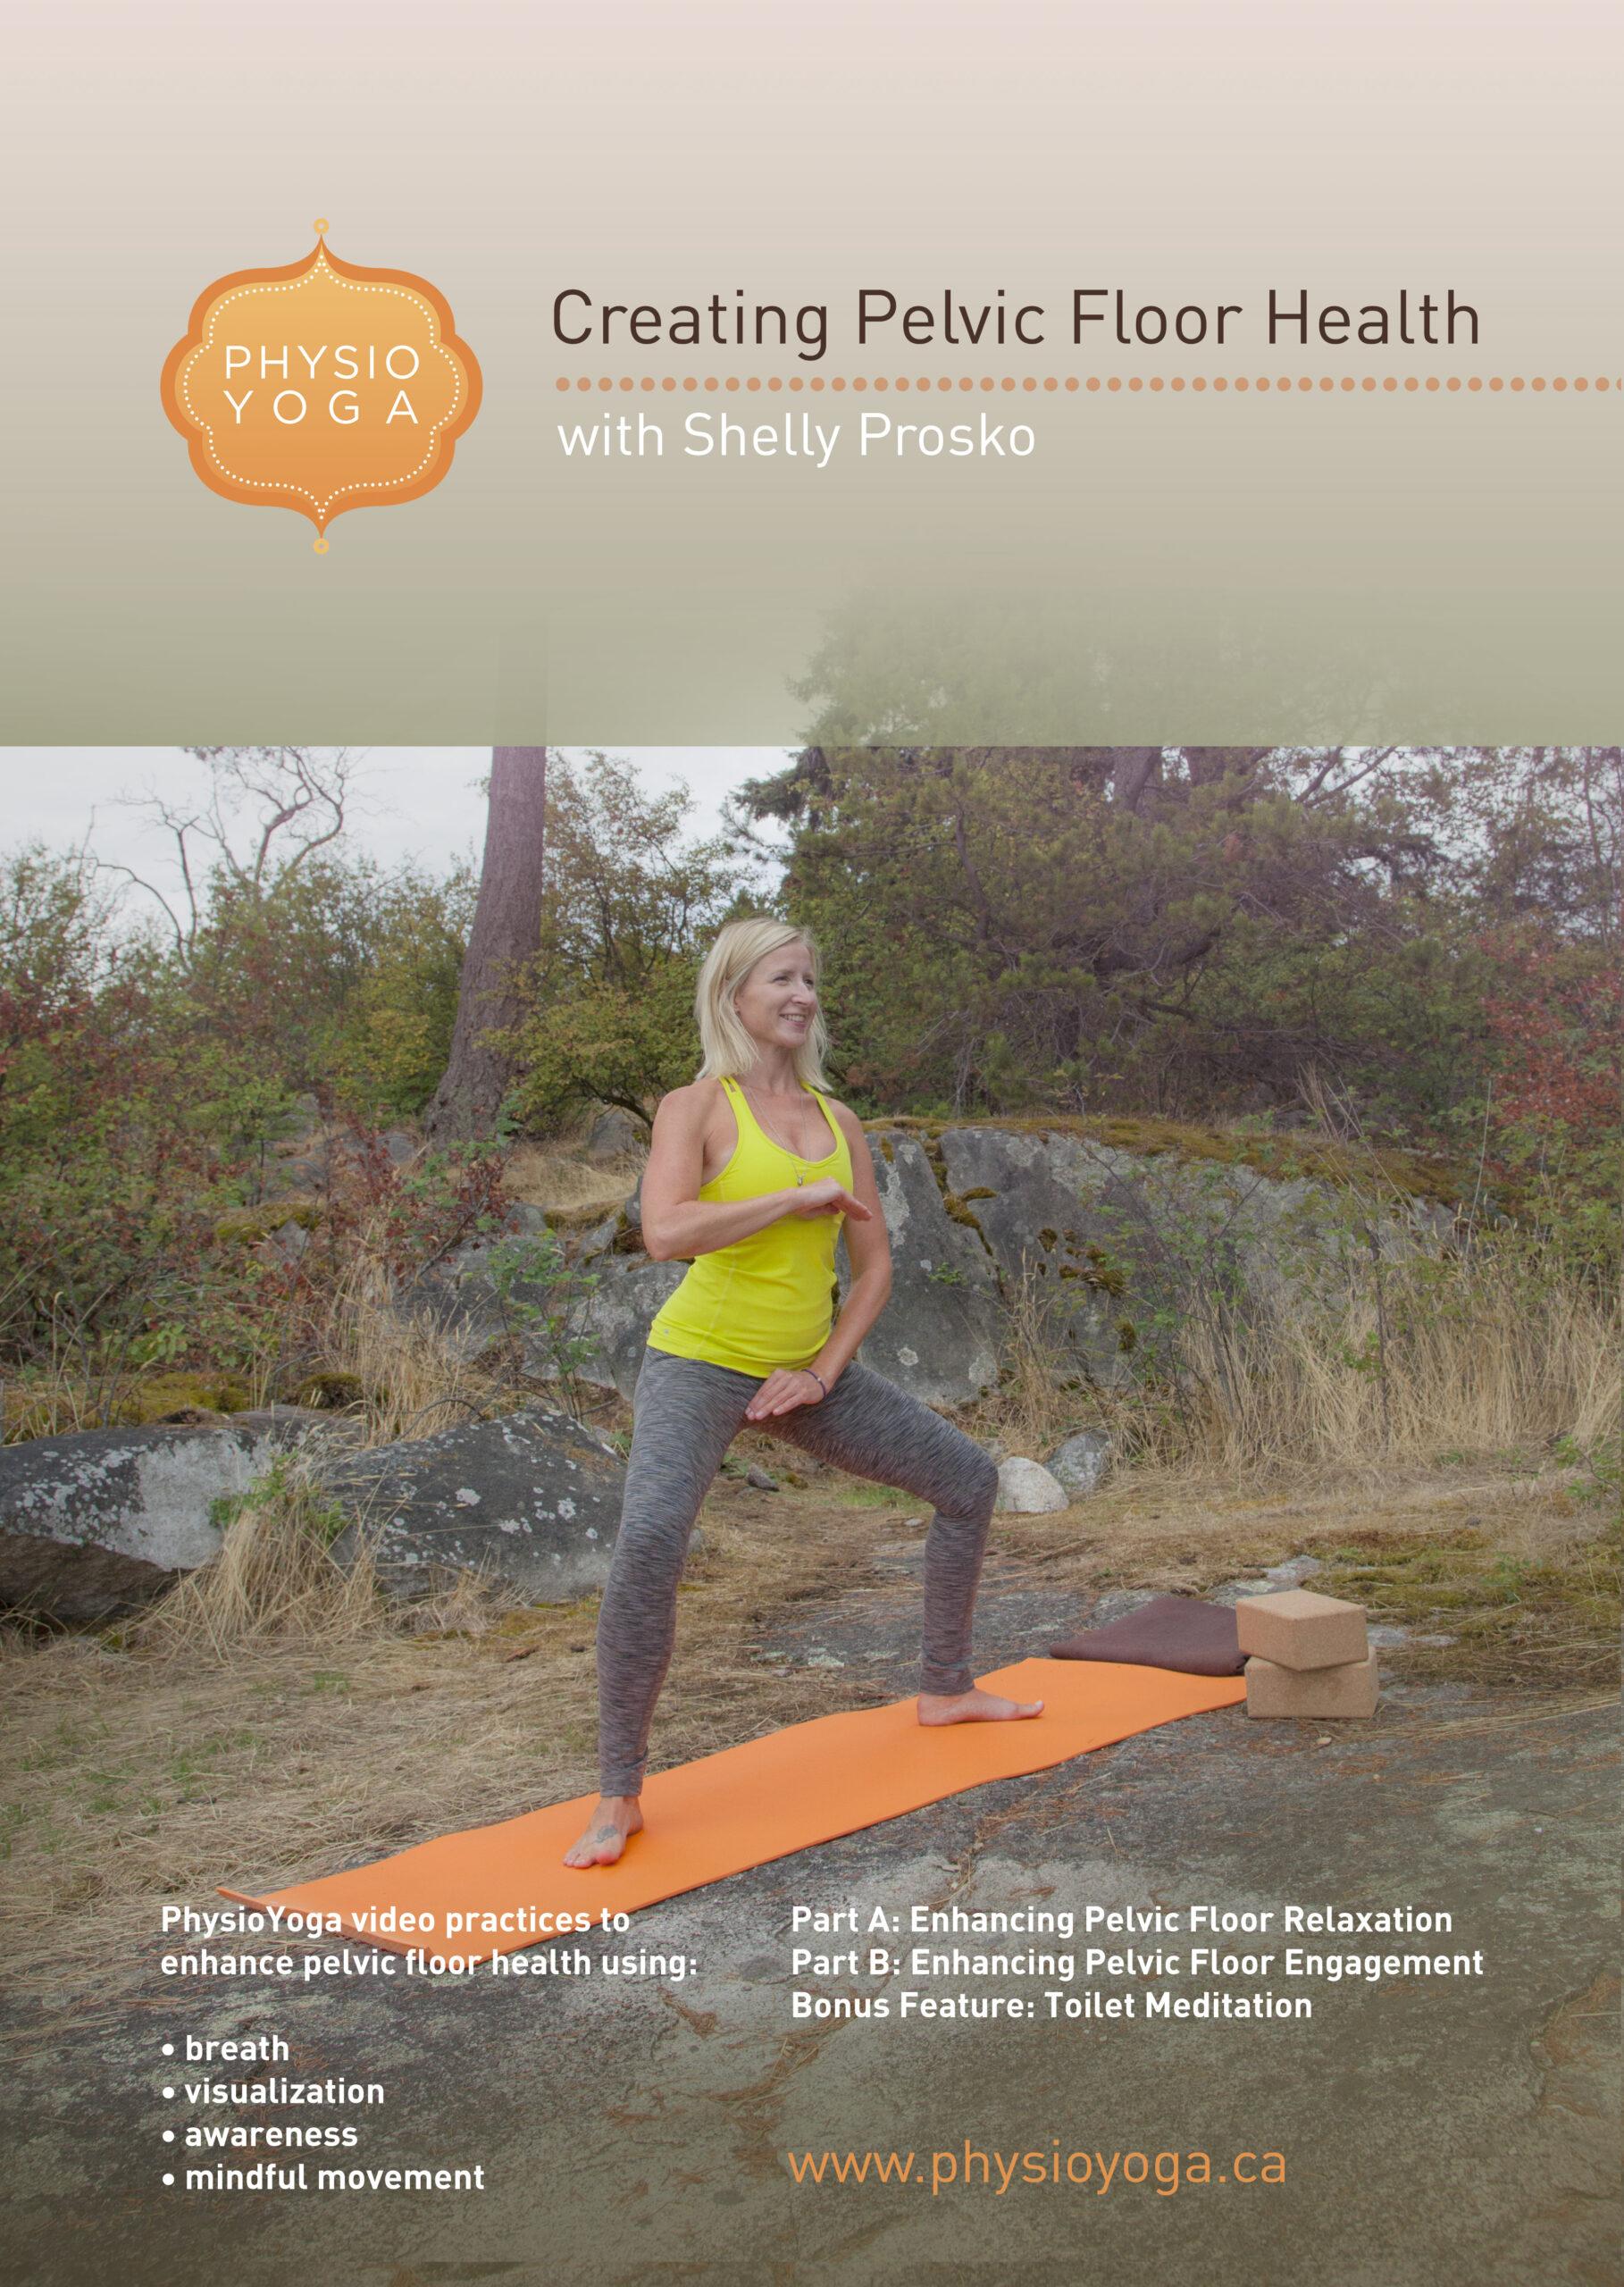 Creating Pelvic Floor Health Yoga Practices